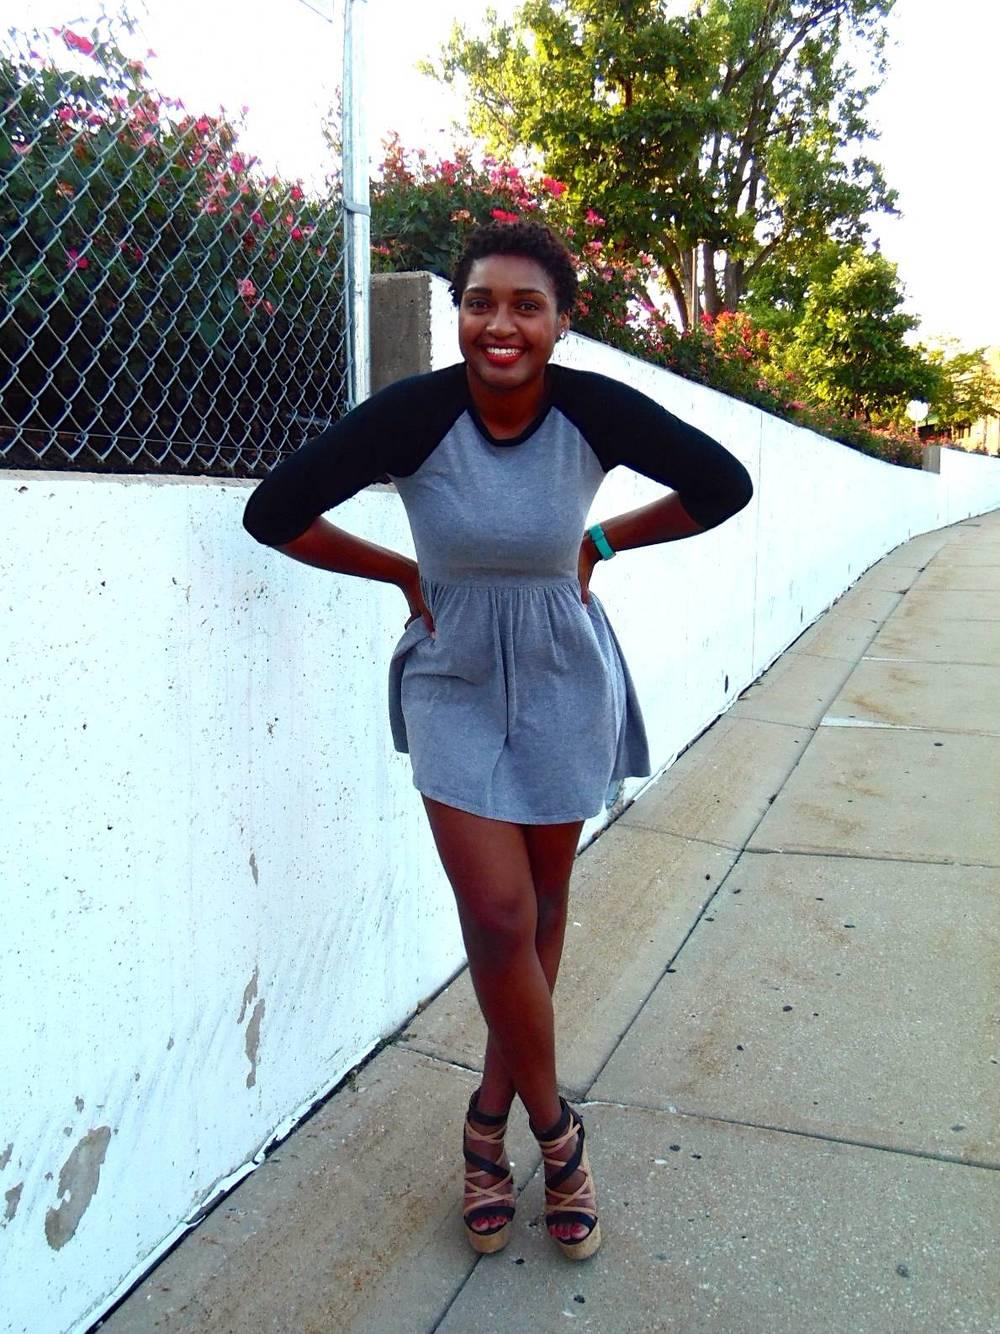 jasmine diane Skater Dress and Wedge Heels